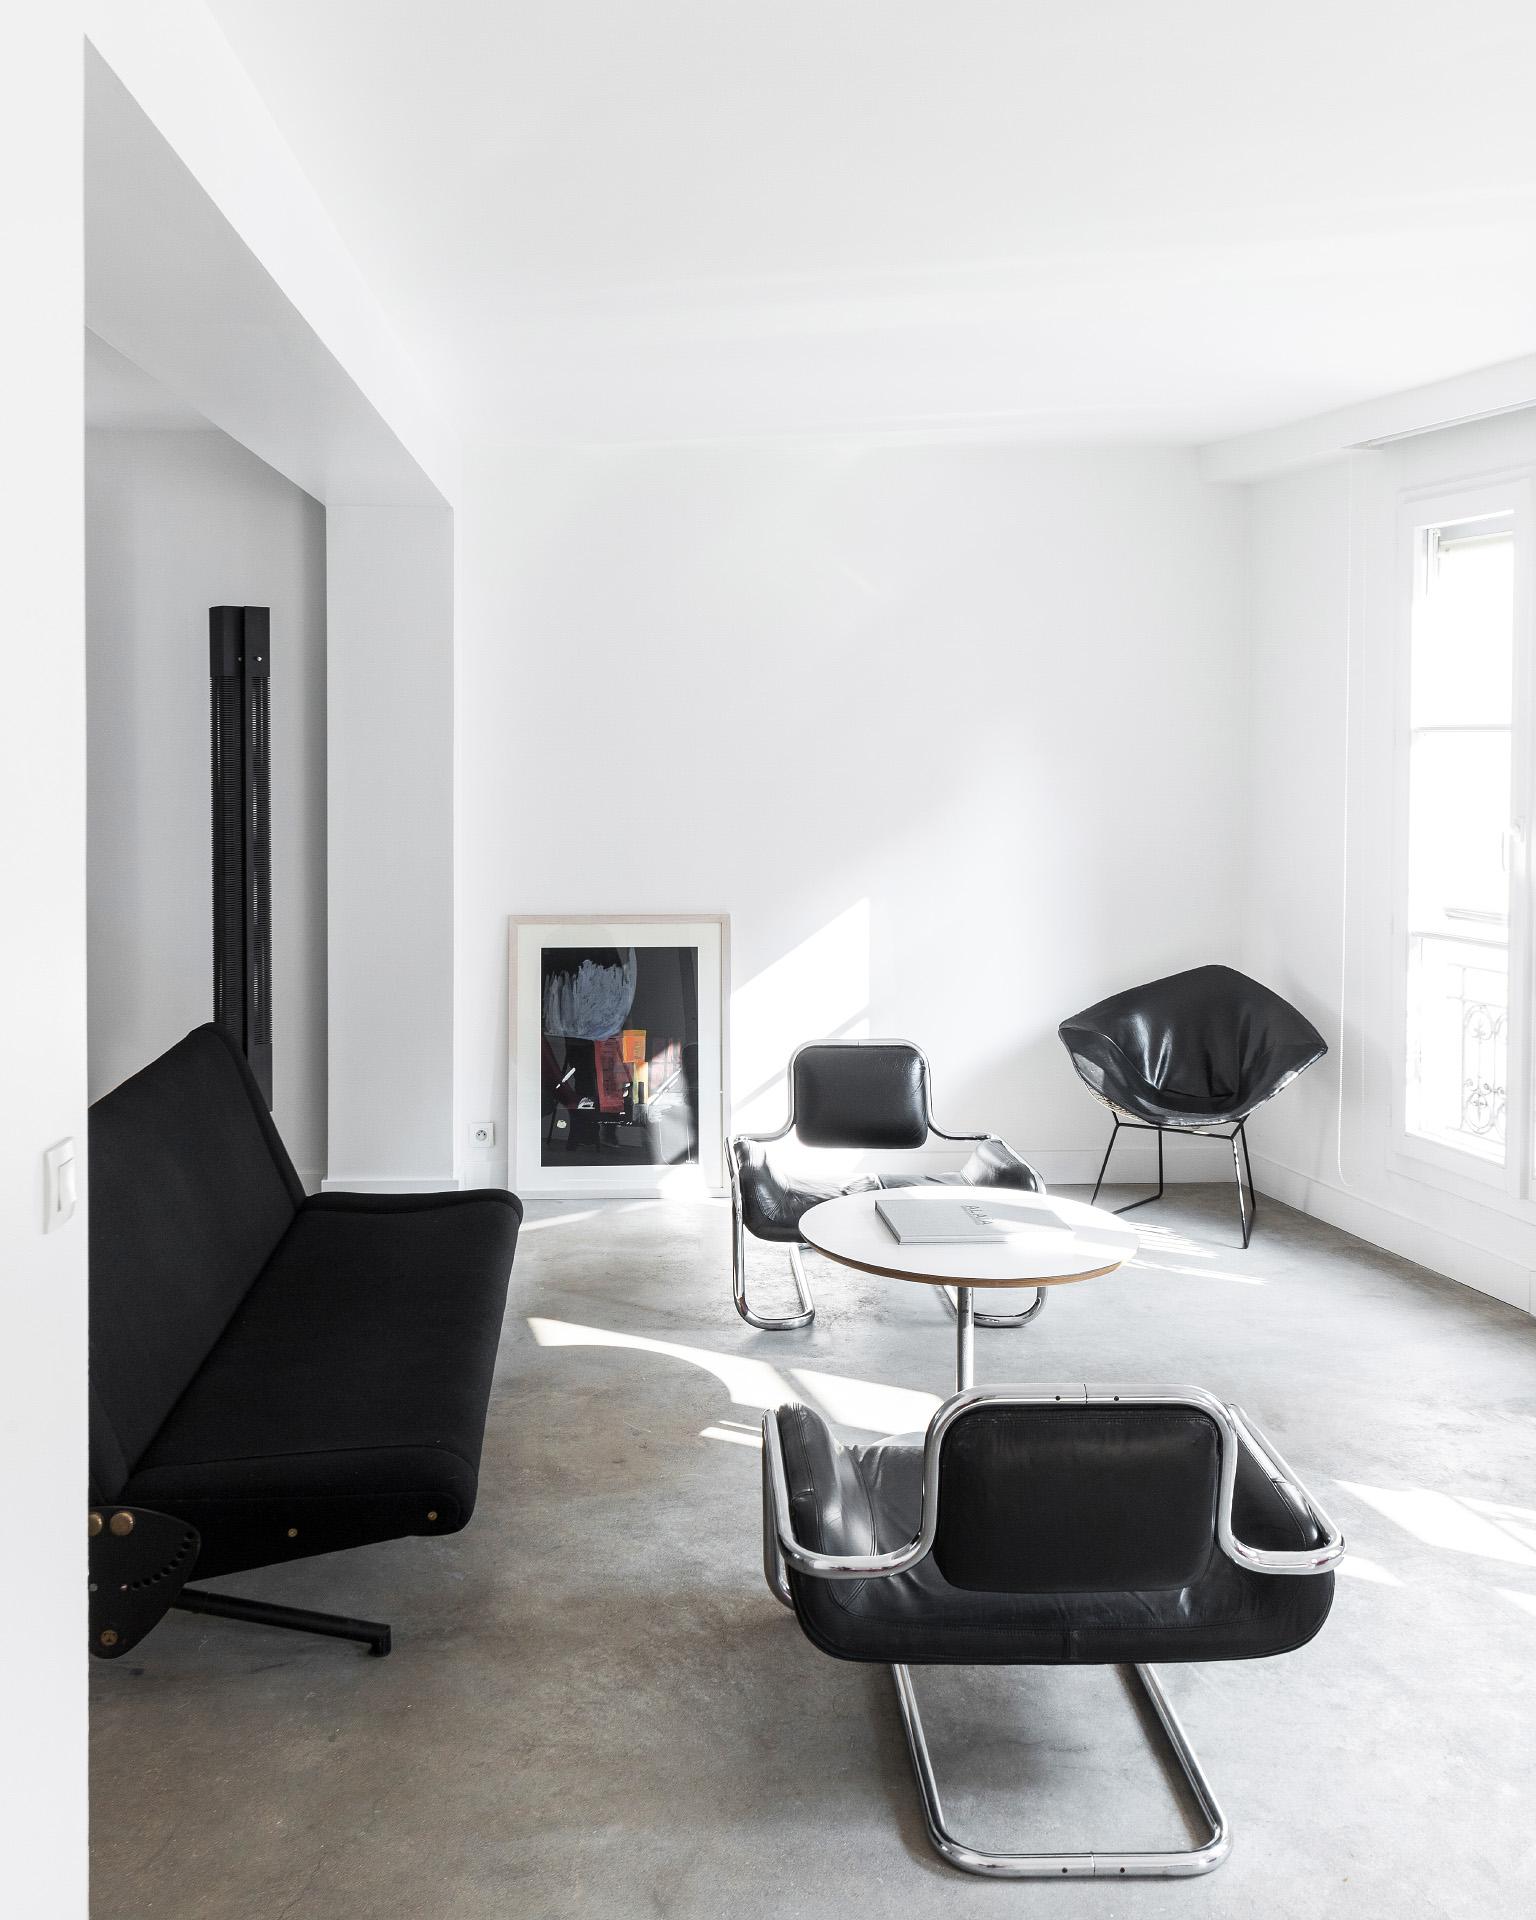 Salon design en plein coeur de Paris